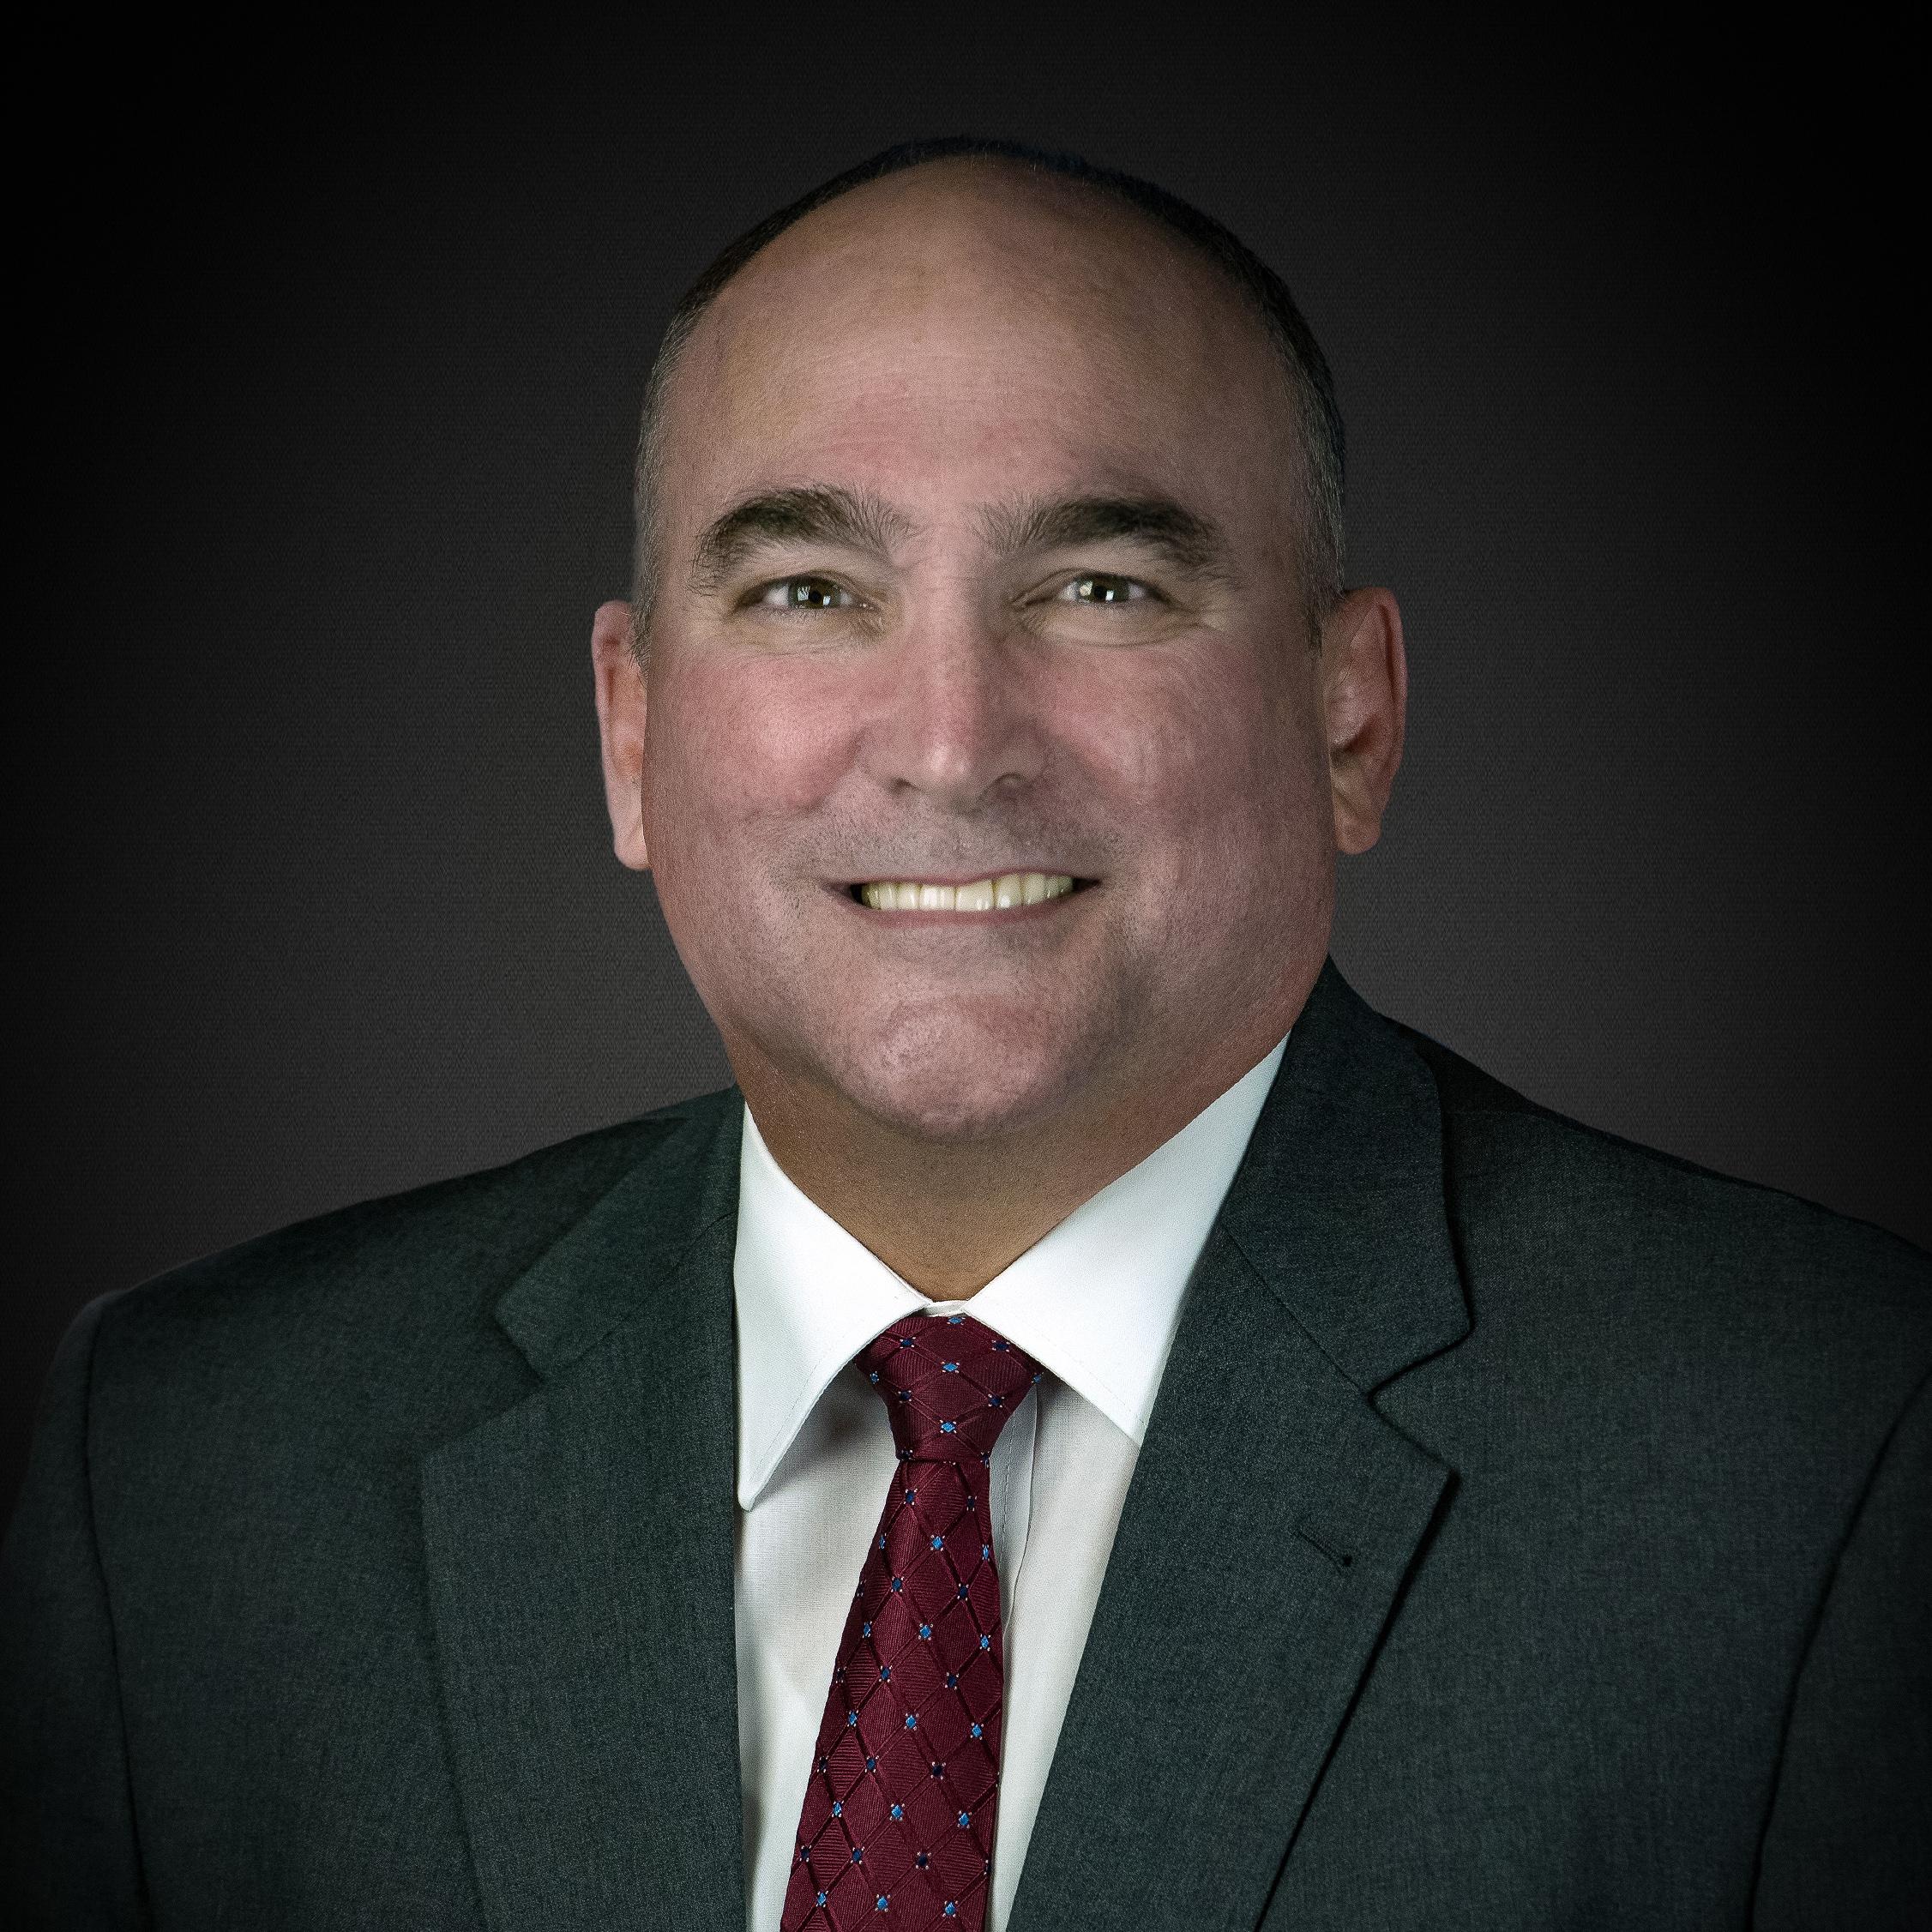 The Hon. Gregory Nadeau Senior Advisor, Public-Private Partnerships